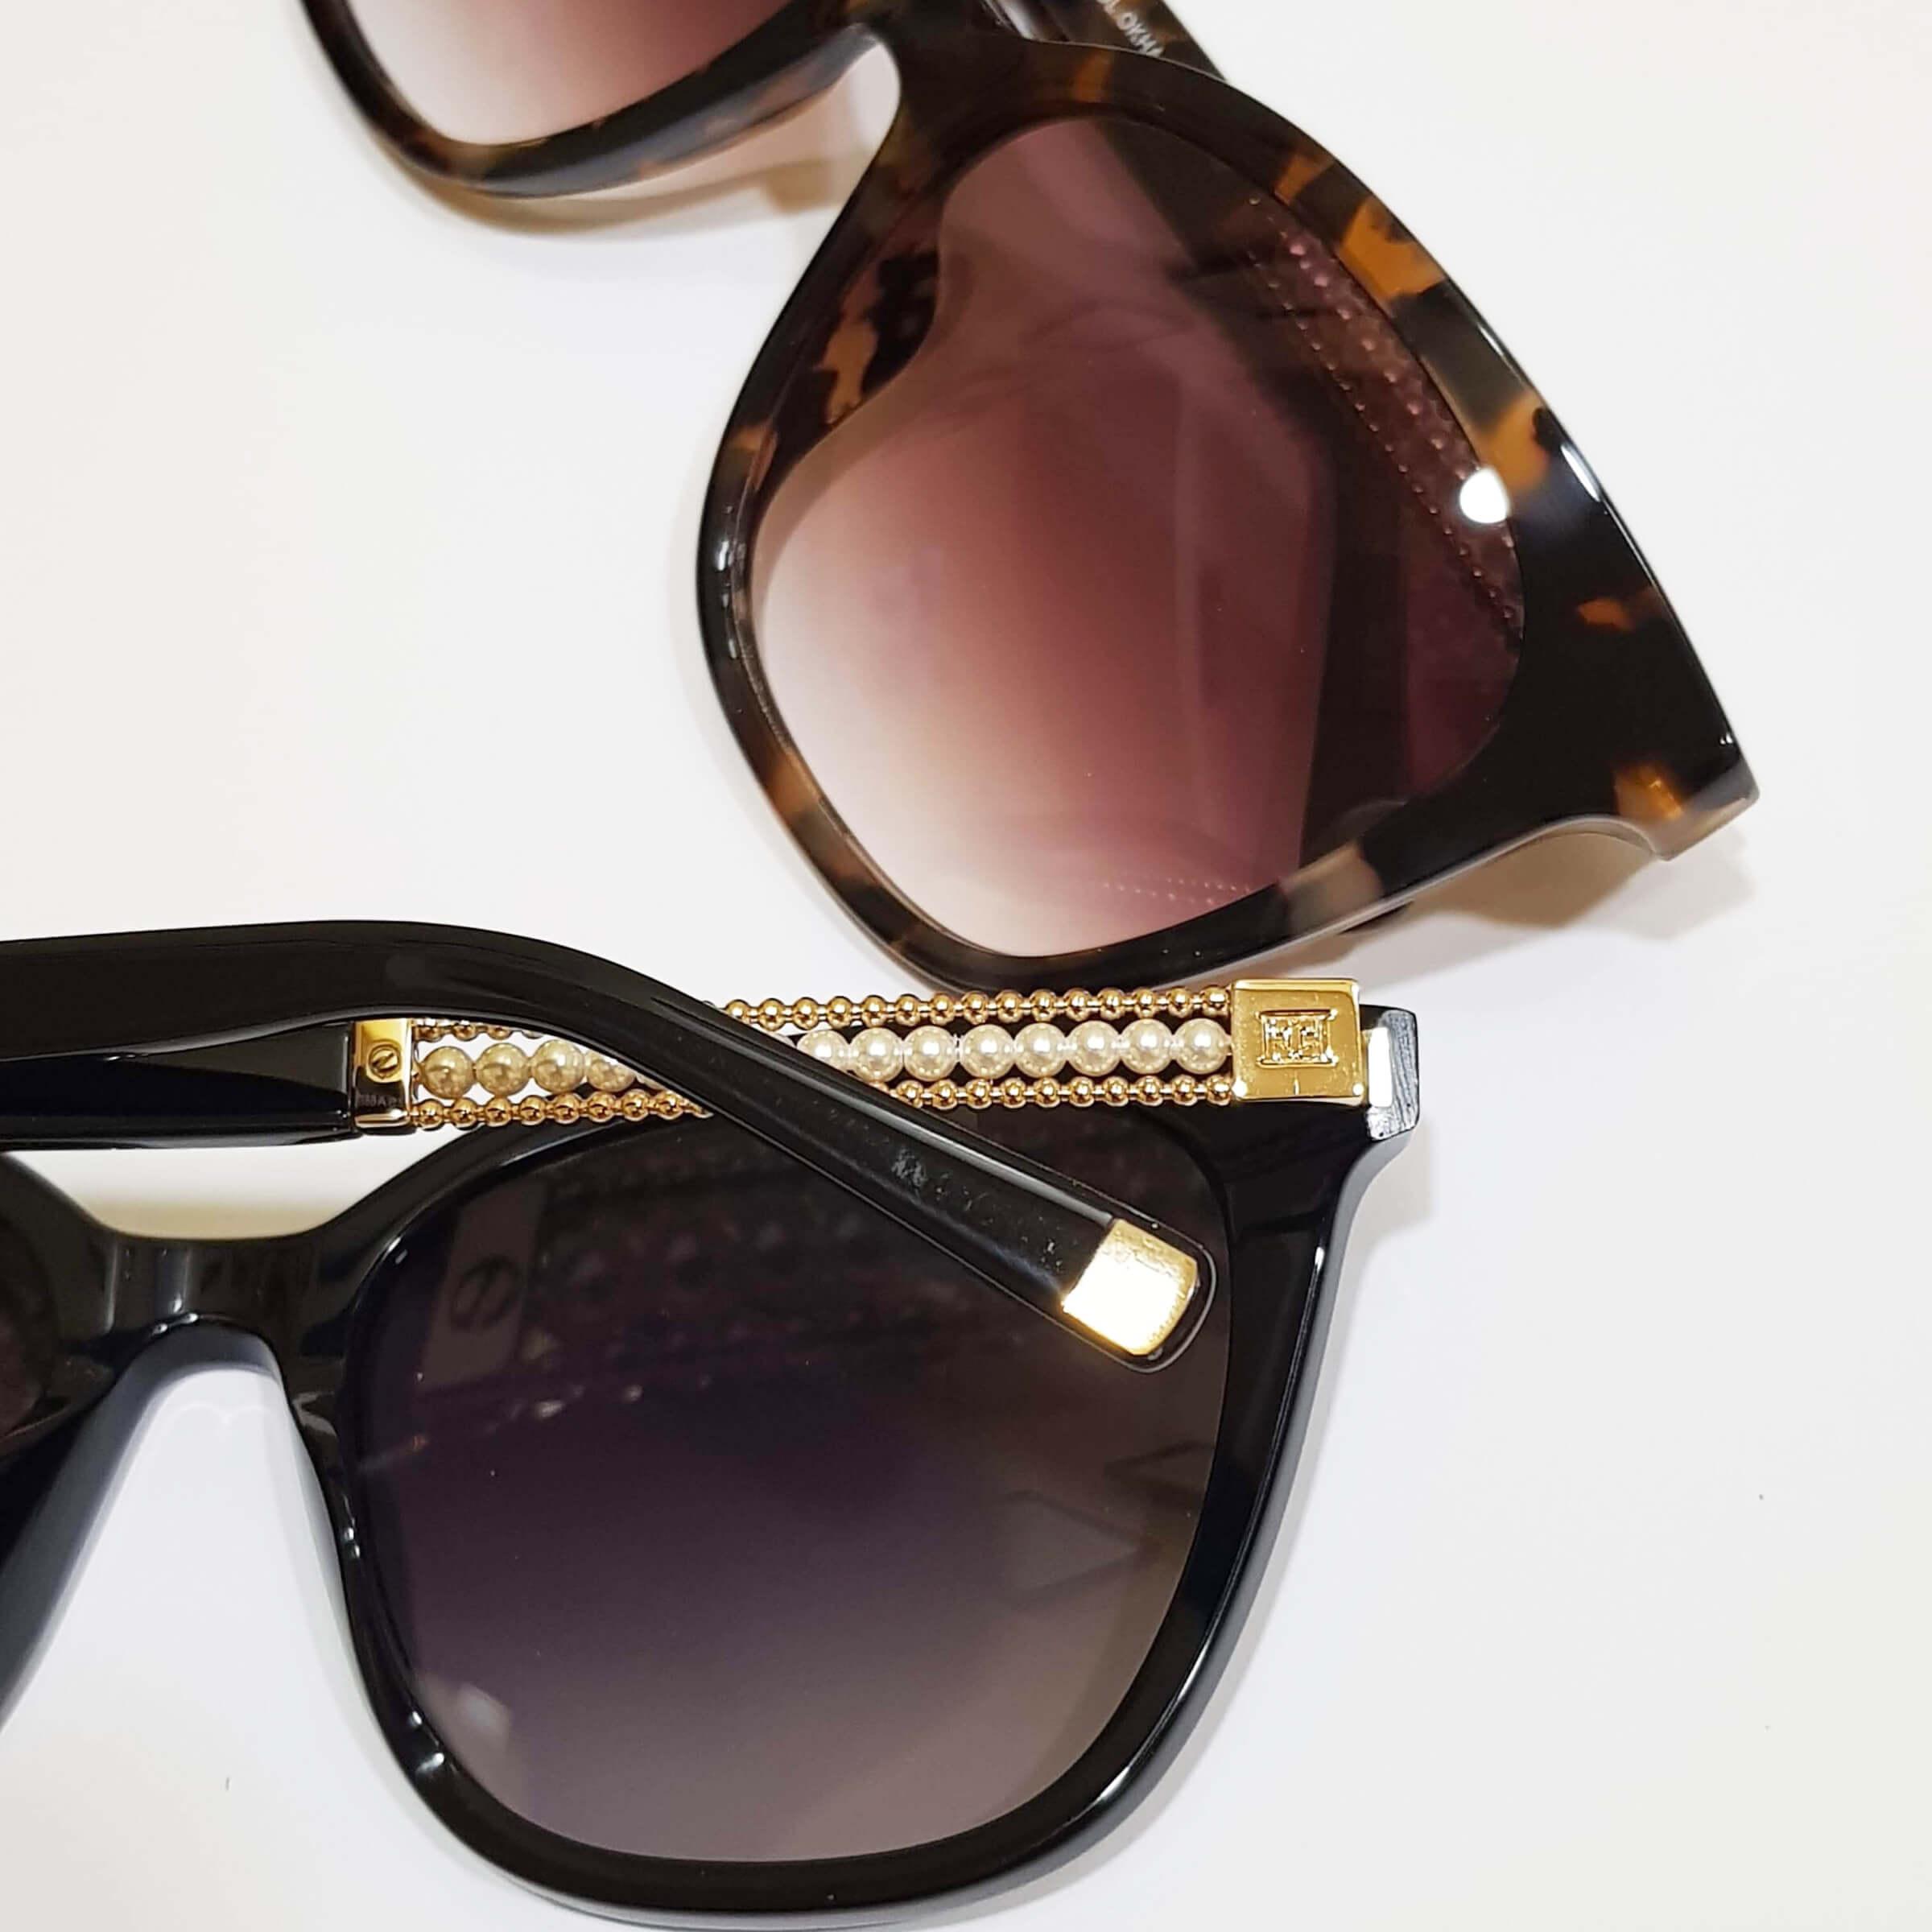 Escada Sunglasses Collection for Women 2019